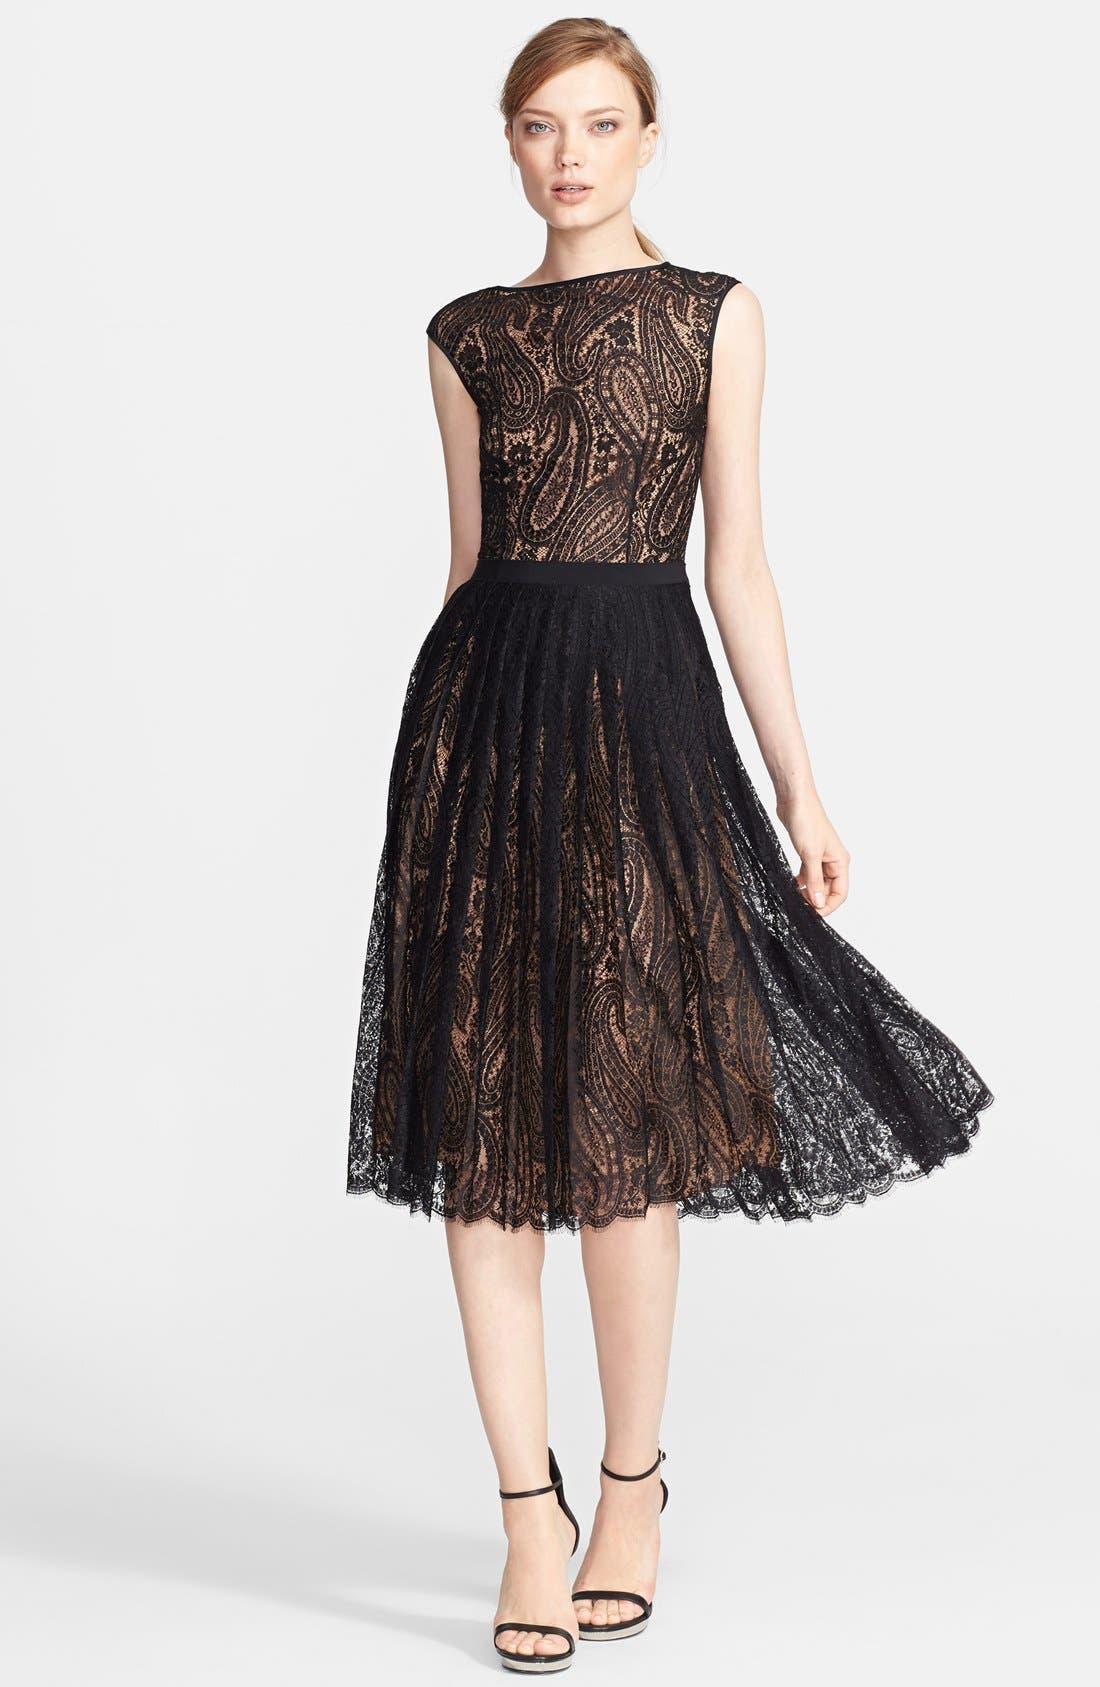 Main Image - Michael Kors Boatneck Paisley Lace Dress